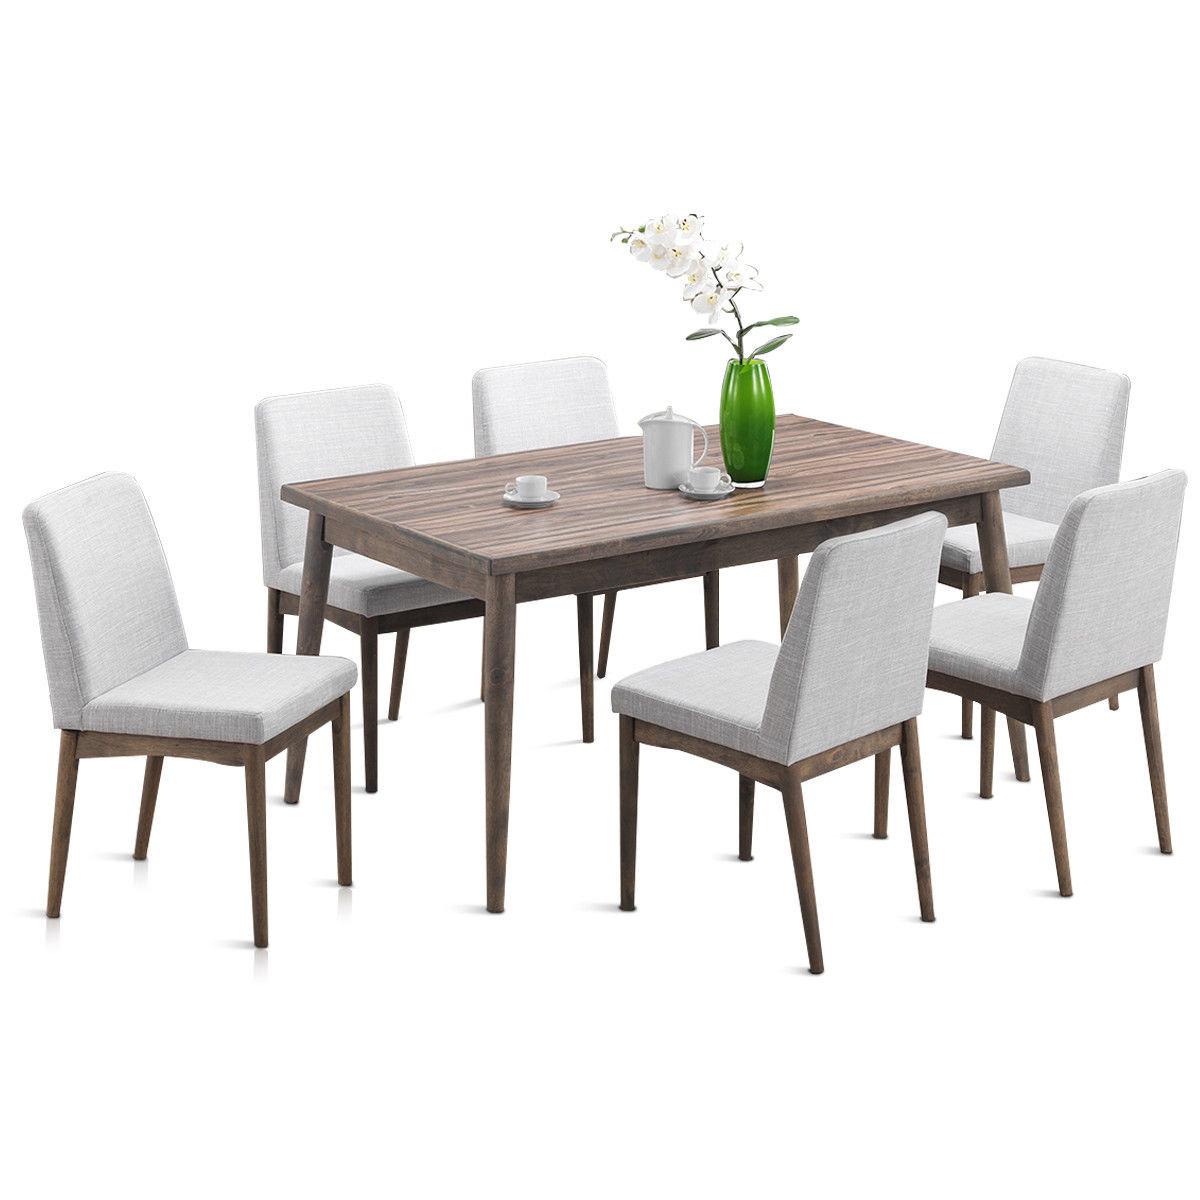 Ebel 7 Piece Dining Set Regarding Newest Travon 5 Piece Dining Sets (Photo 11 of 20)